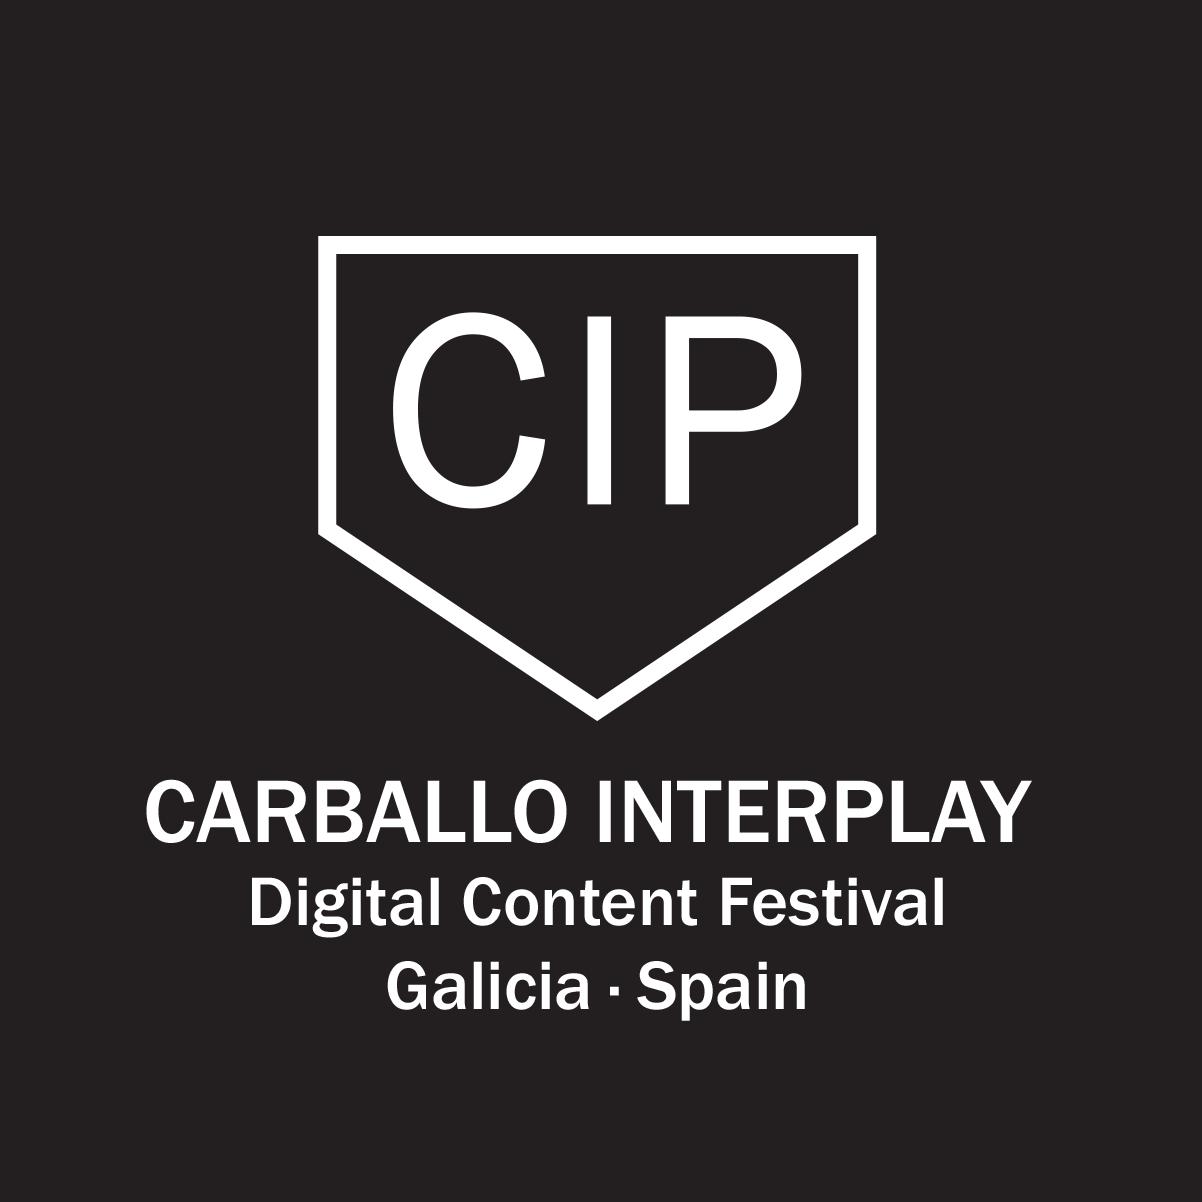 logos_cip_english.png